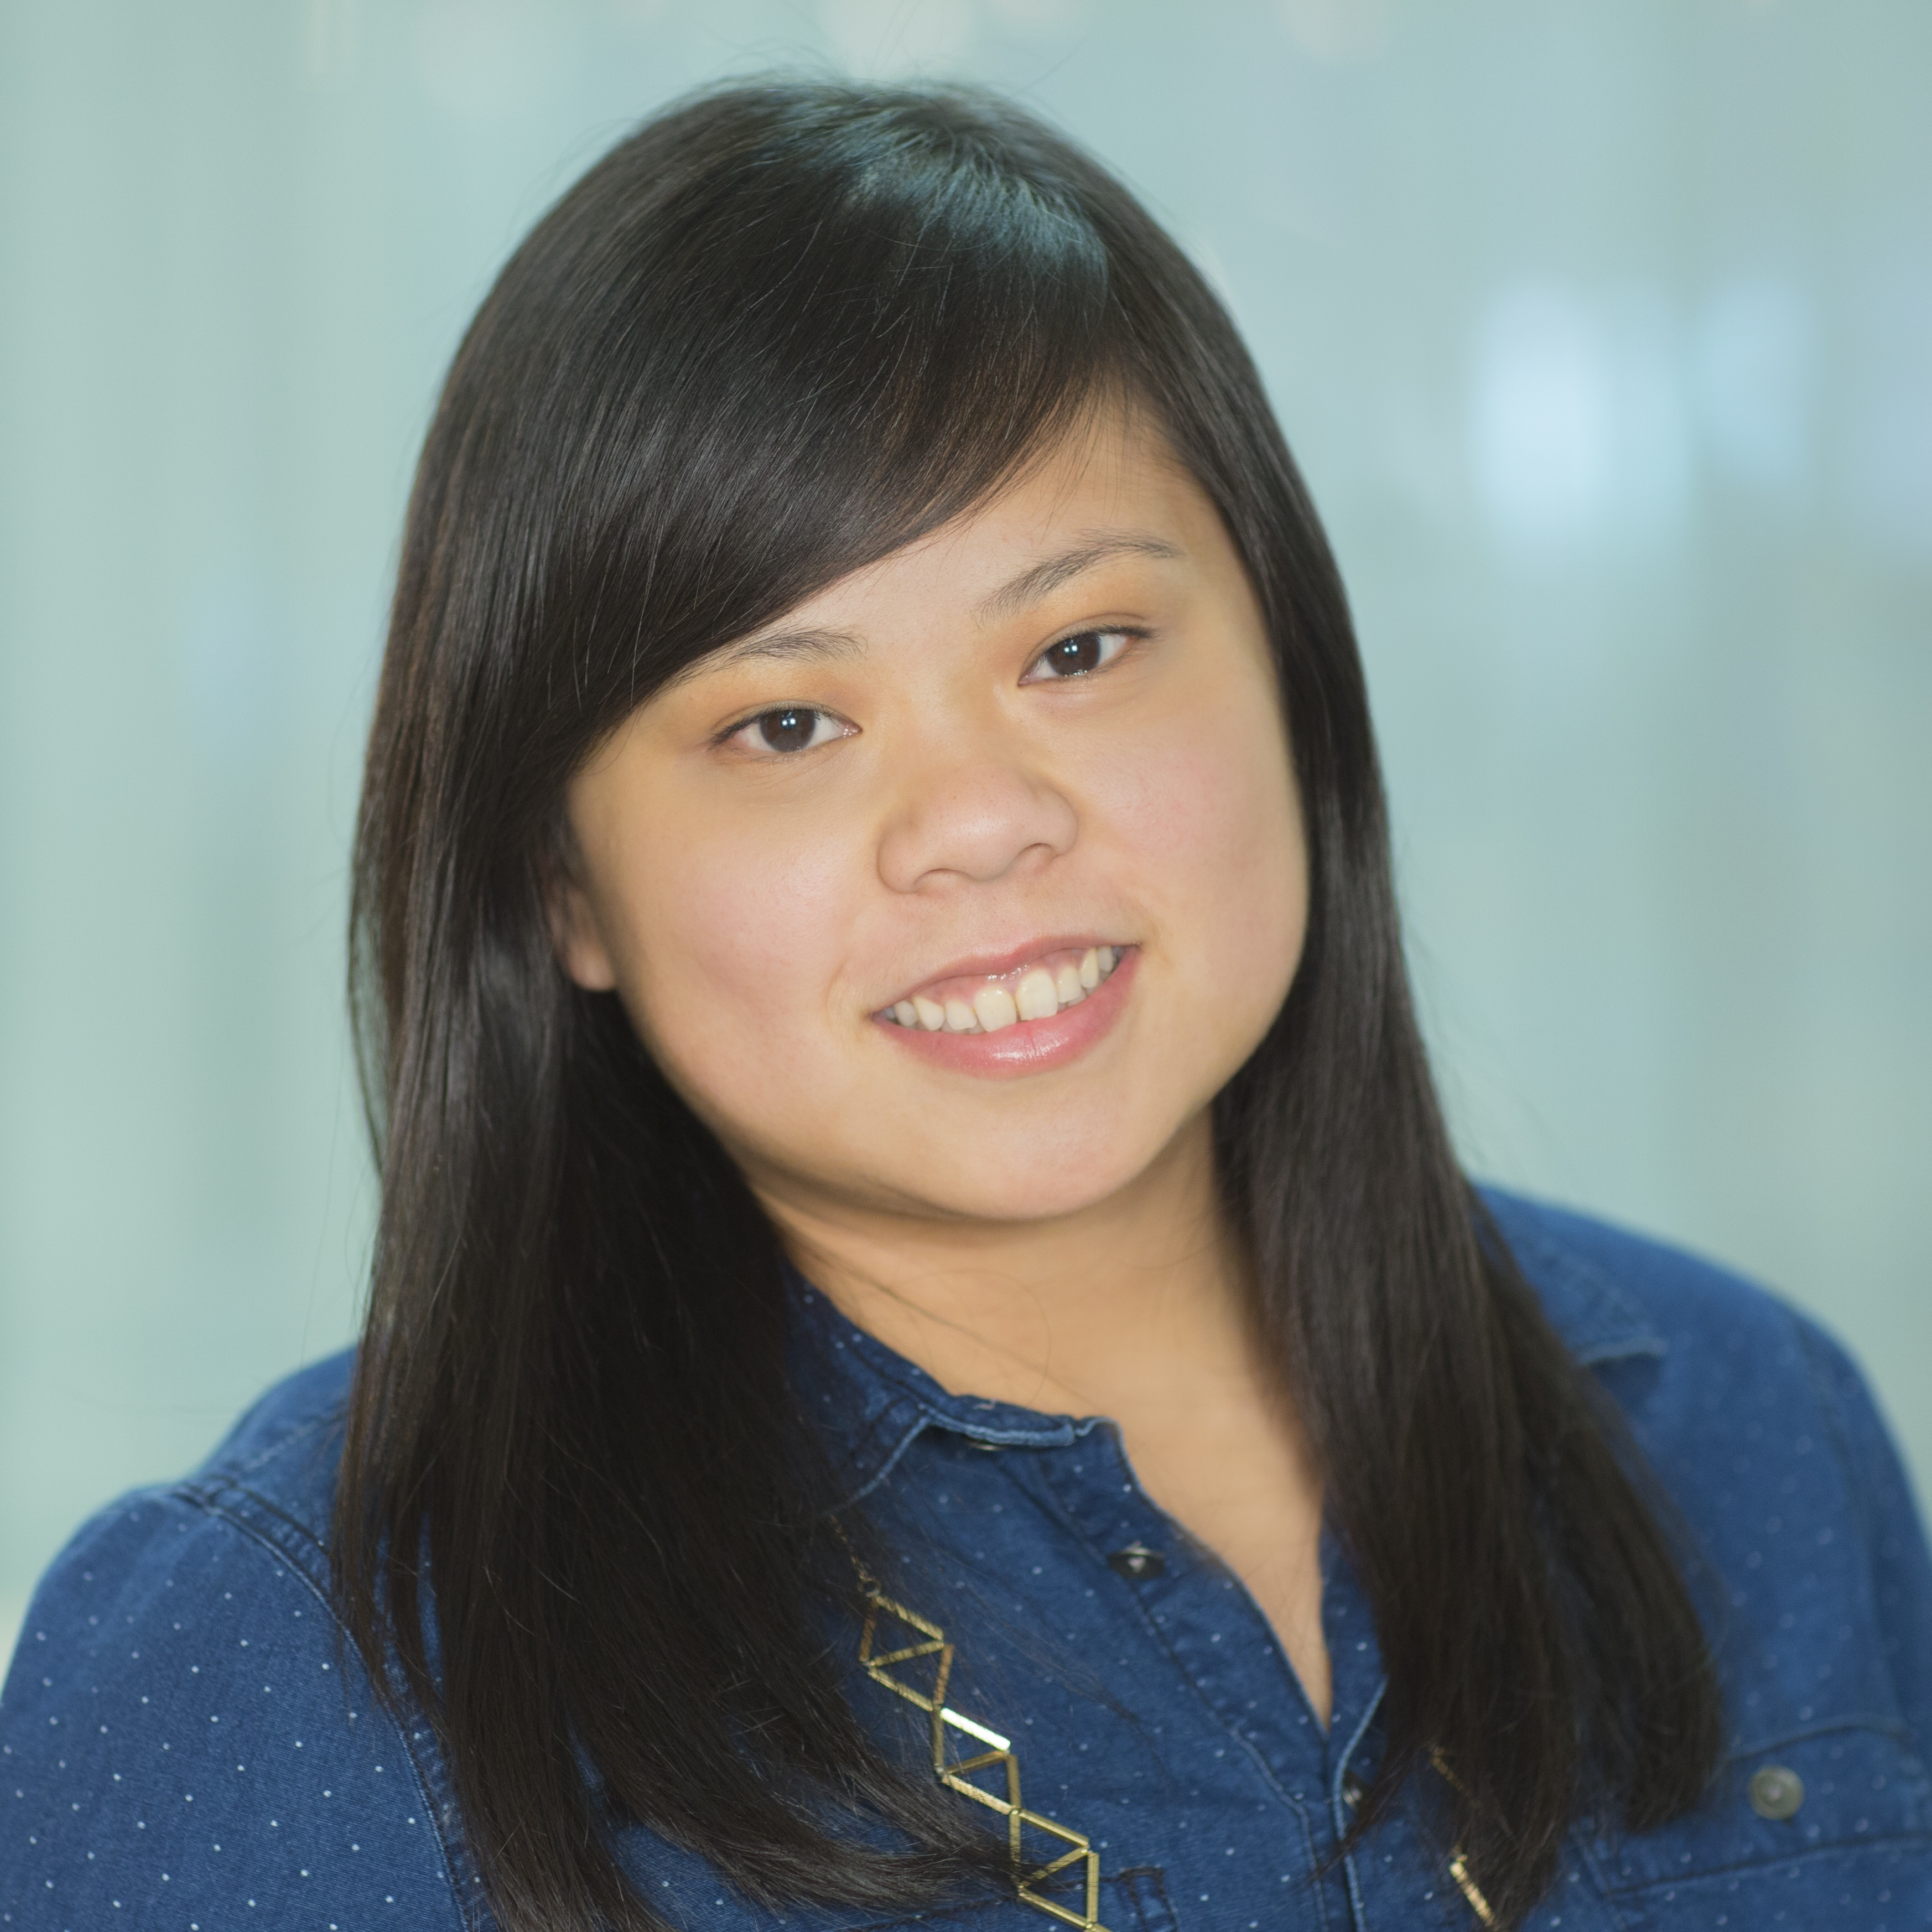 Christine Huynh